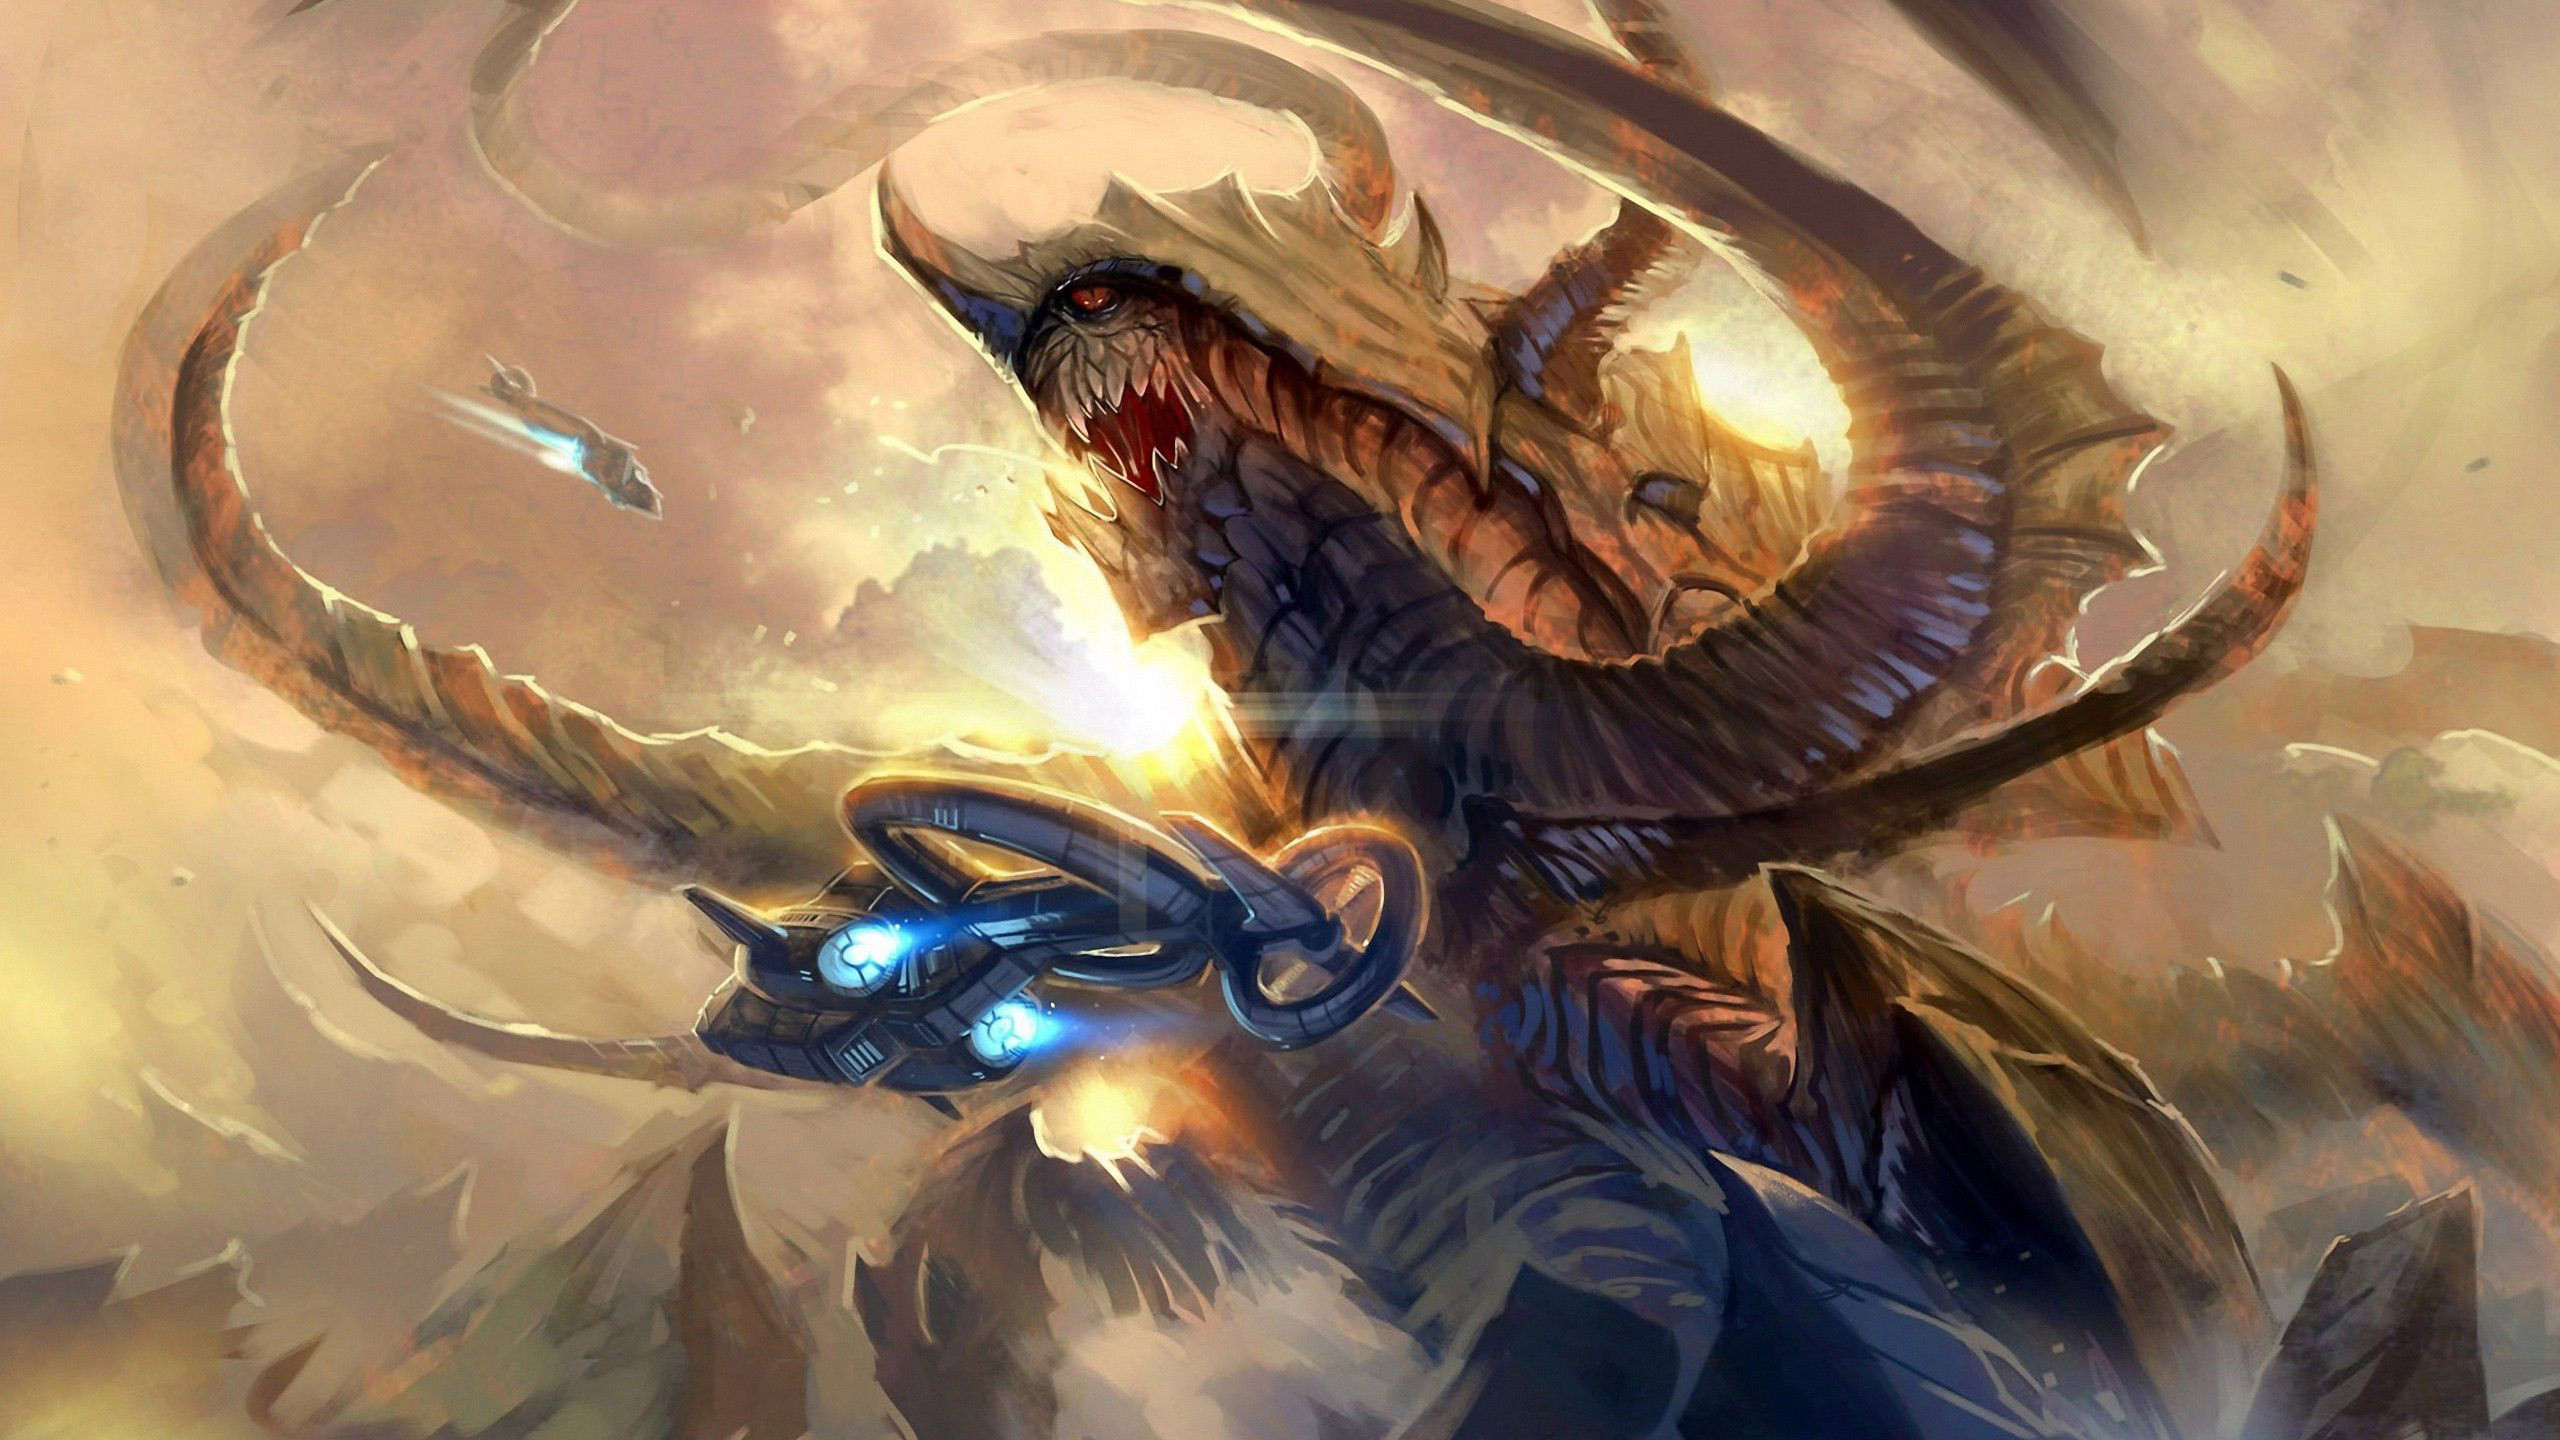 Starcraft wallpaper 87 immagini - Starcraft 2 wallpaper art ...